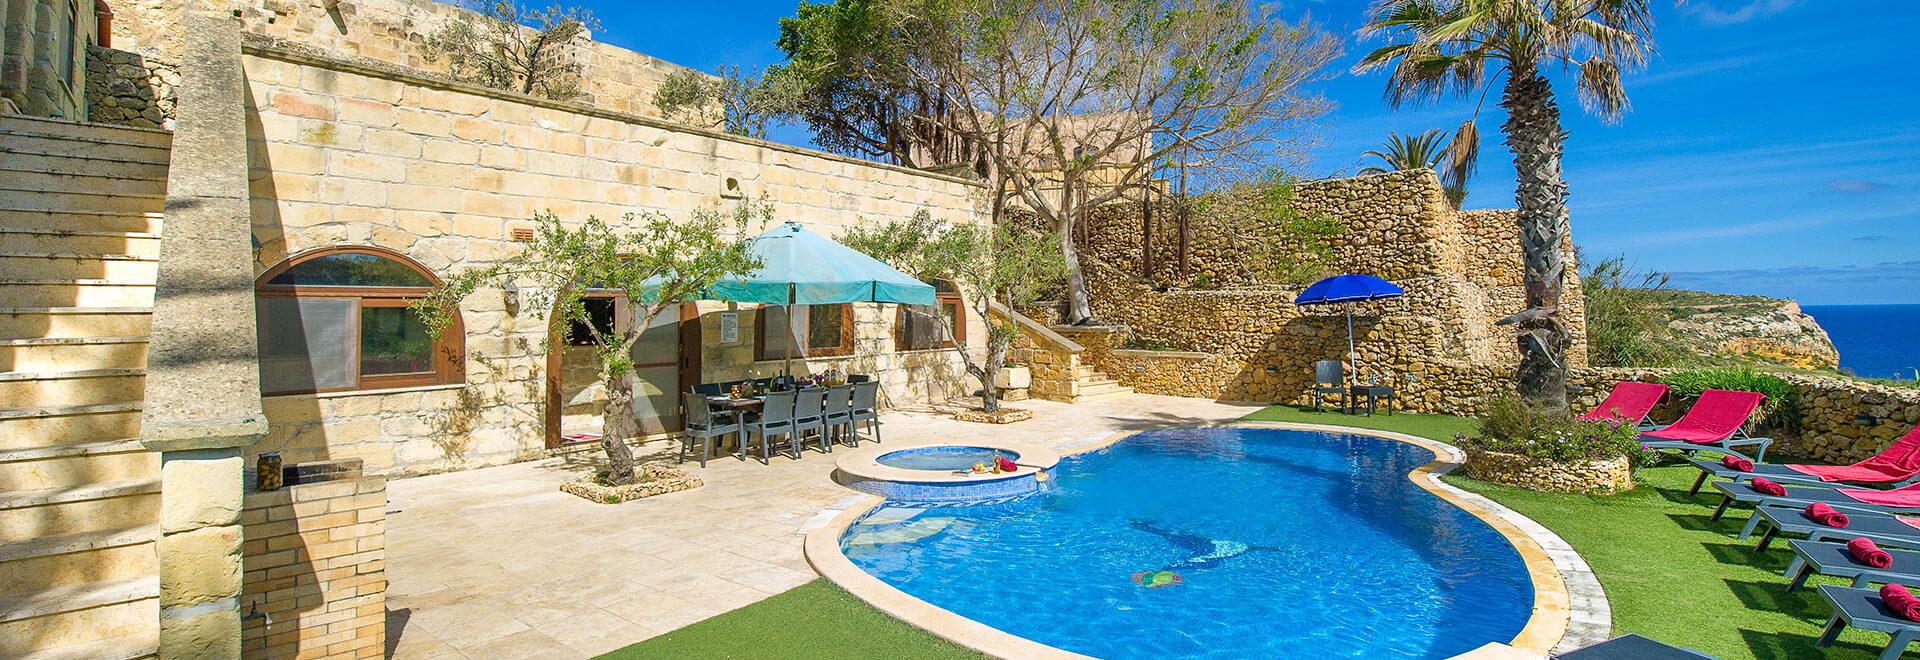 Pool & Garden 1